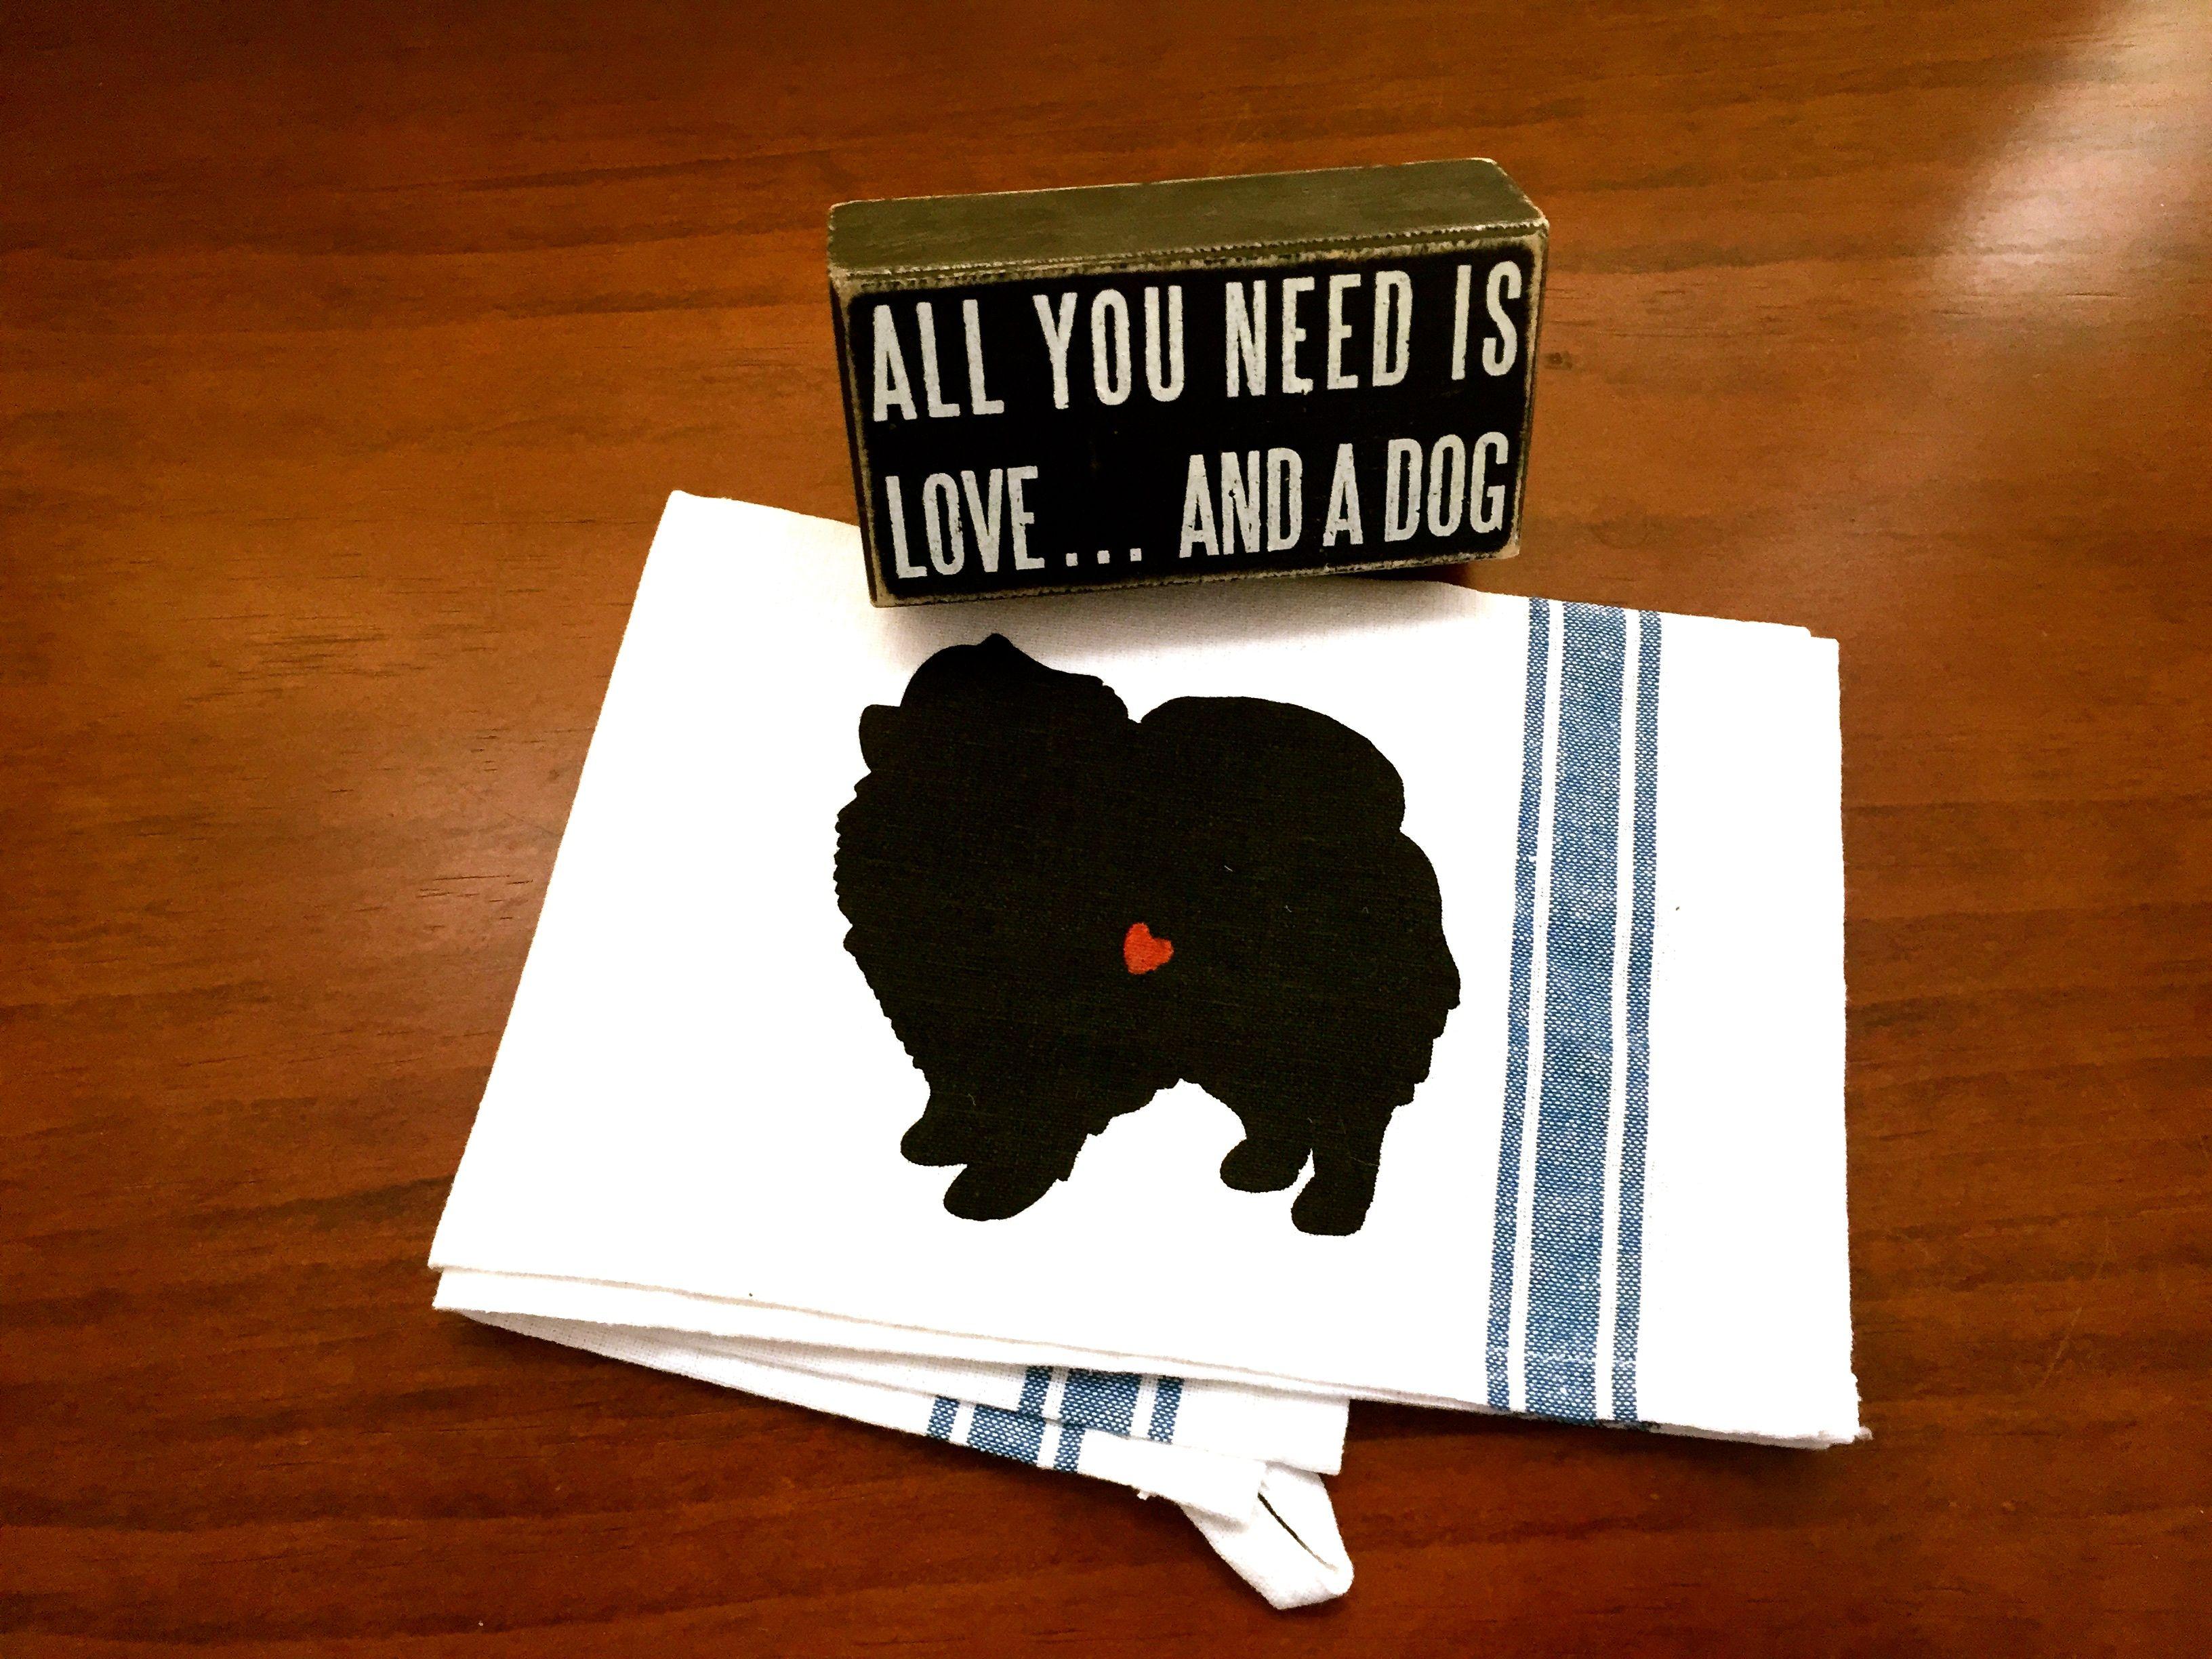 Pomeranian Tea Towel Kitchen Dish Cloth Decor % to ANIMAL RESCUE ECO